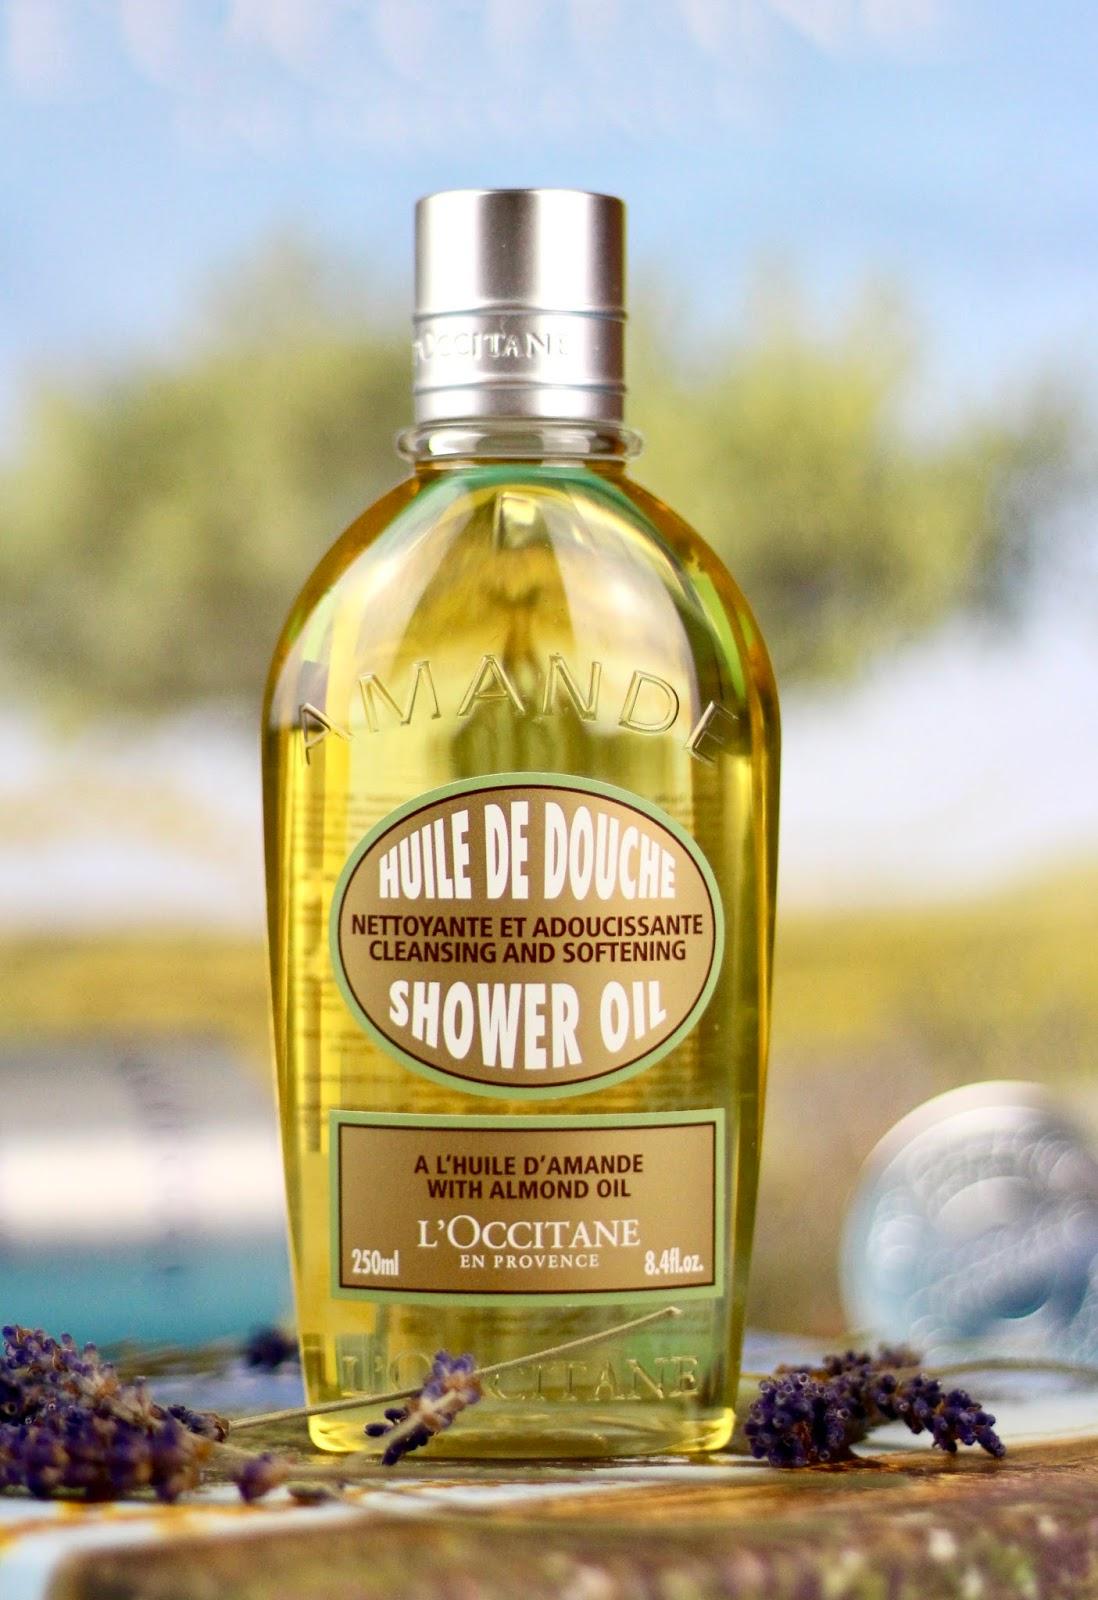 loccitane sprchovy olej recenzia